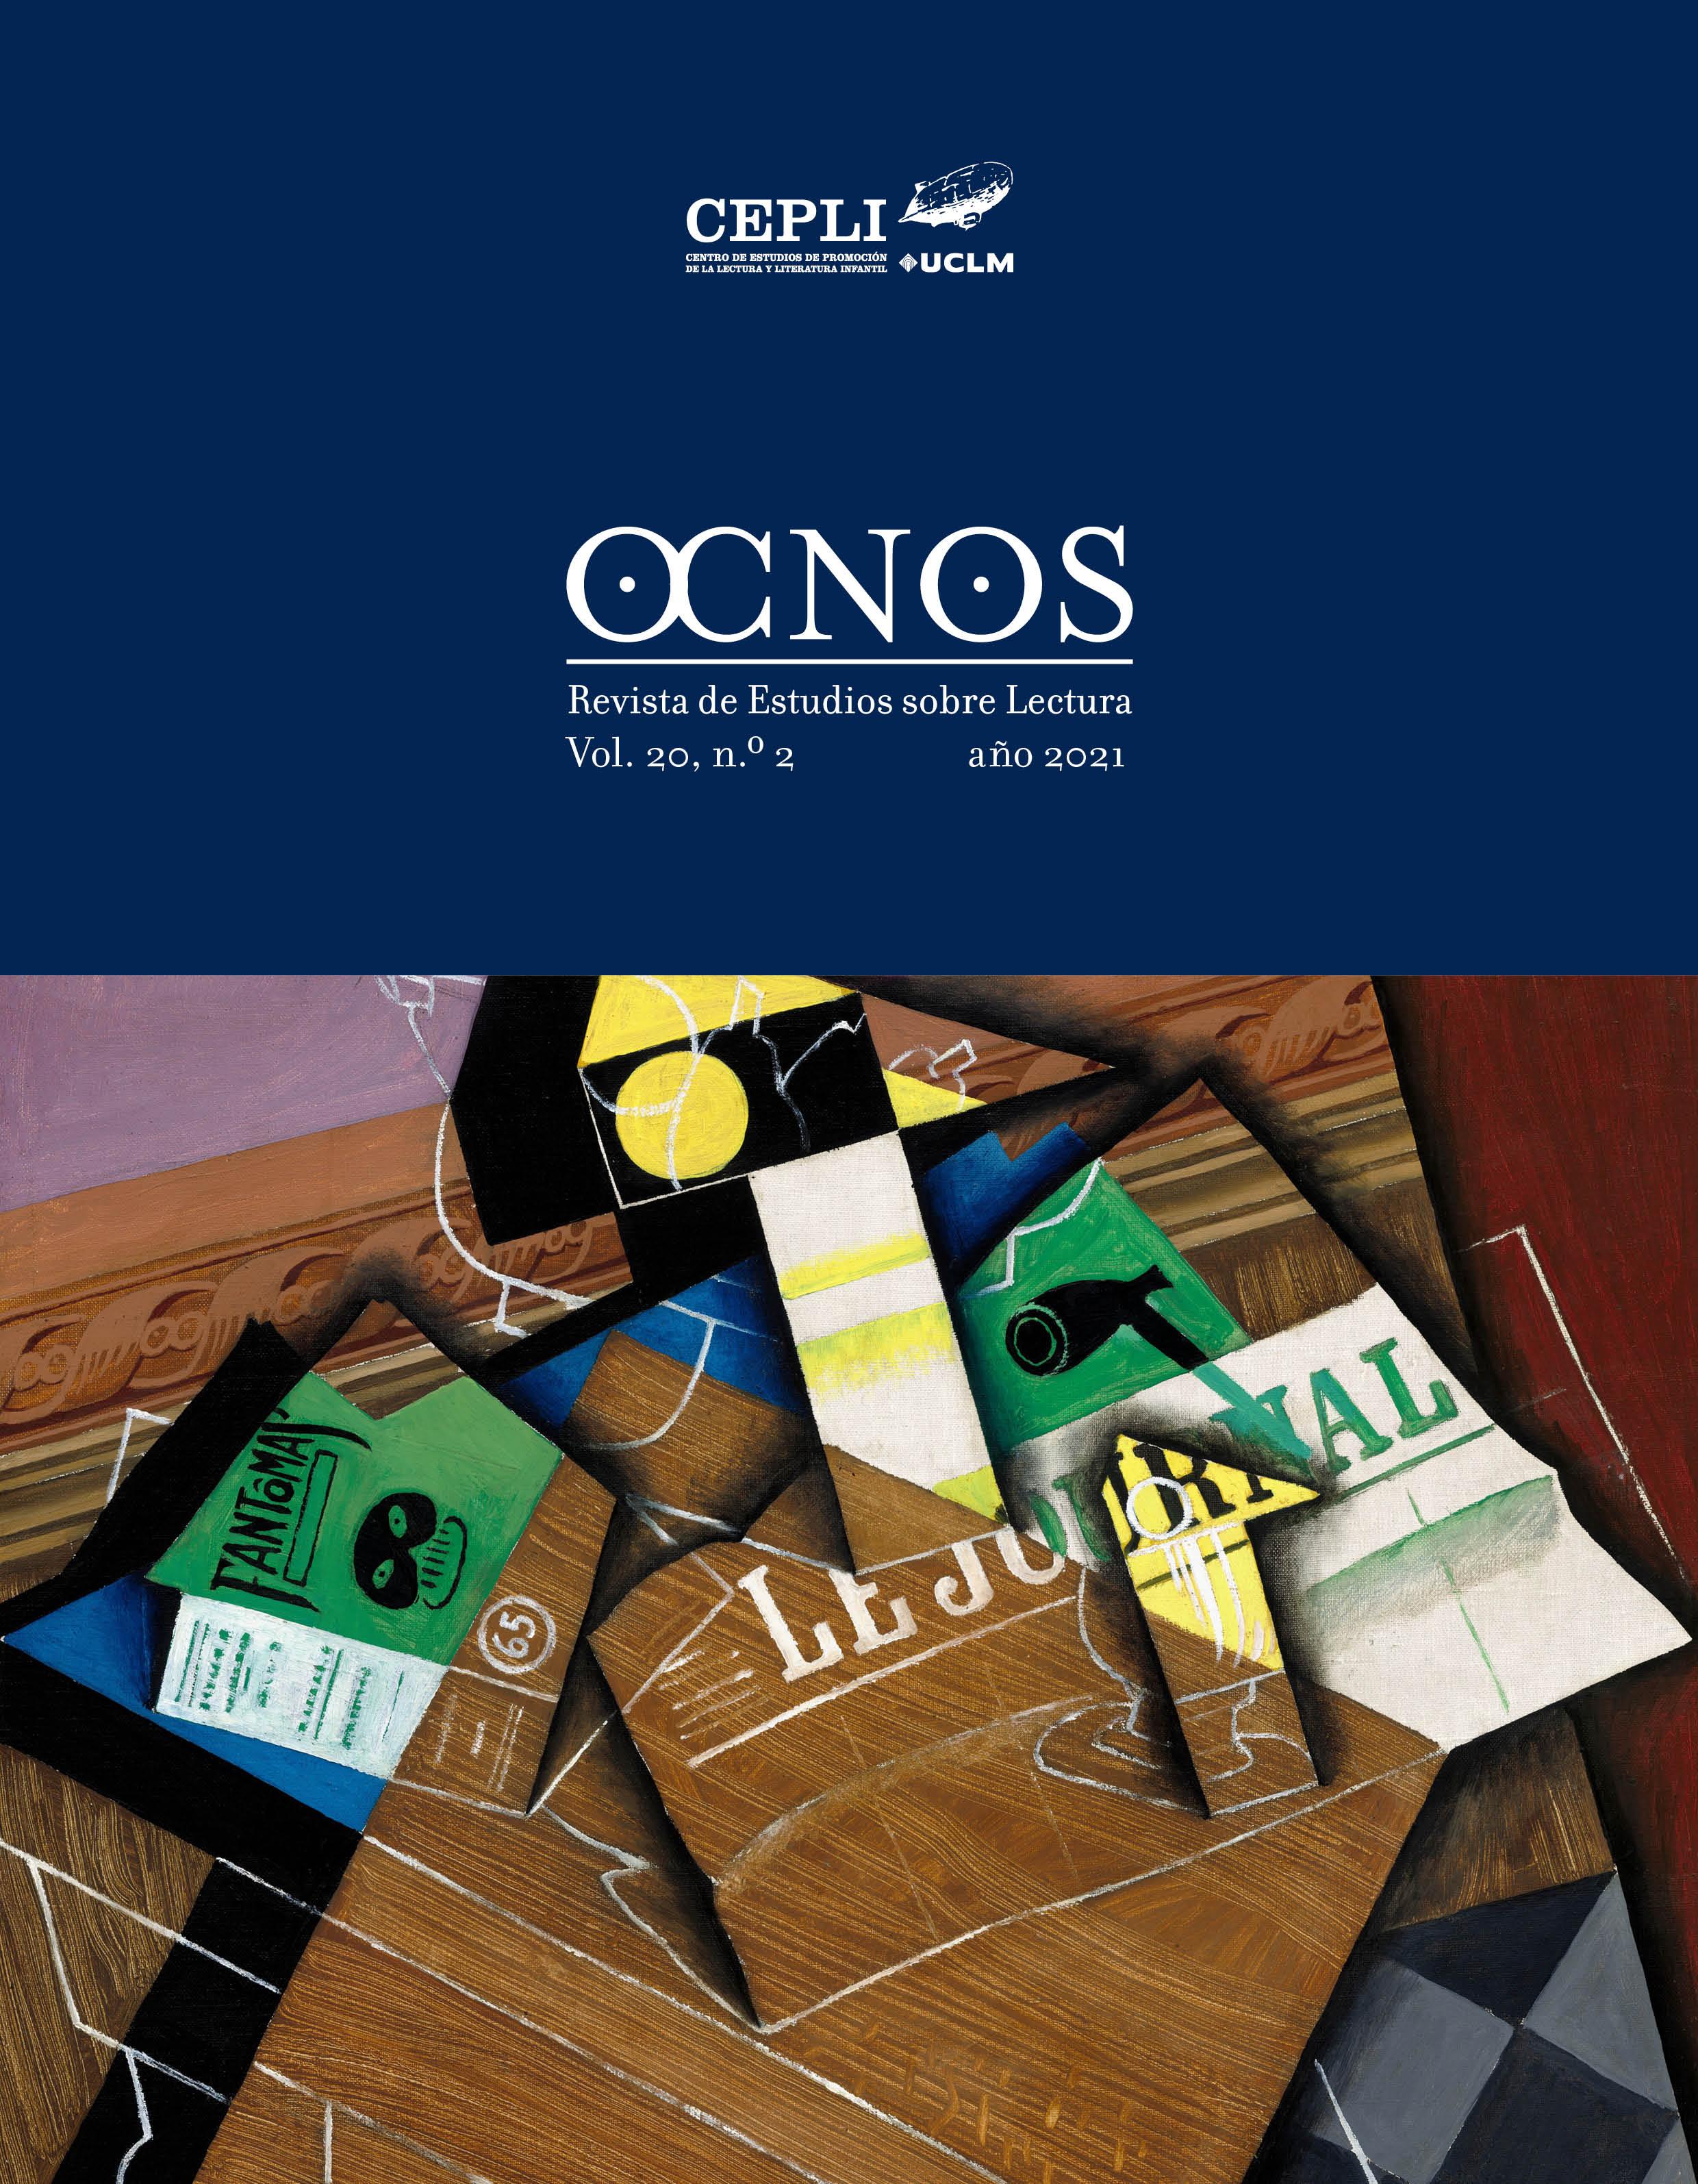 Cubierta Ocnos. Revista de estudios sobre lectura.